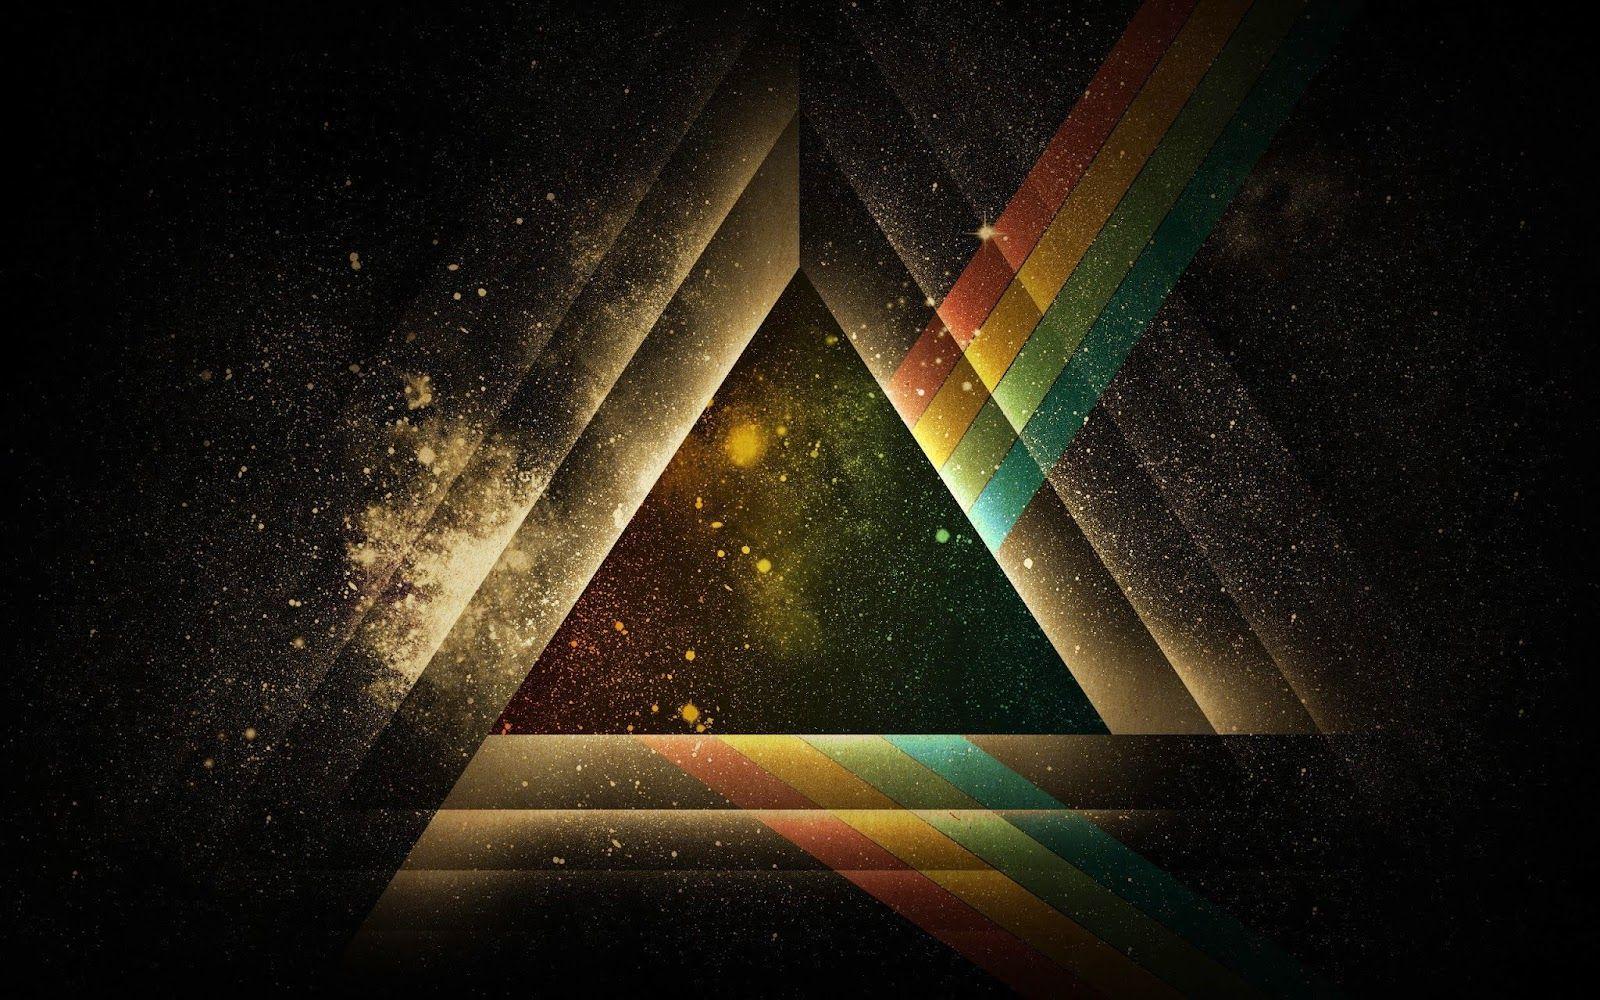 Pink Floyd Triangle Wallsheets Desktop Wallpapers And Backgrounds Triangle Art Pink Floyd Wallpaper Art Wallpaper